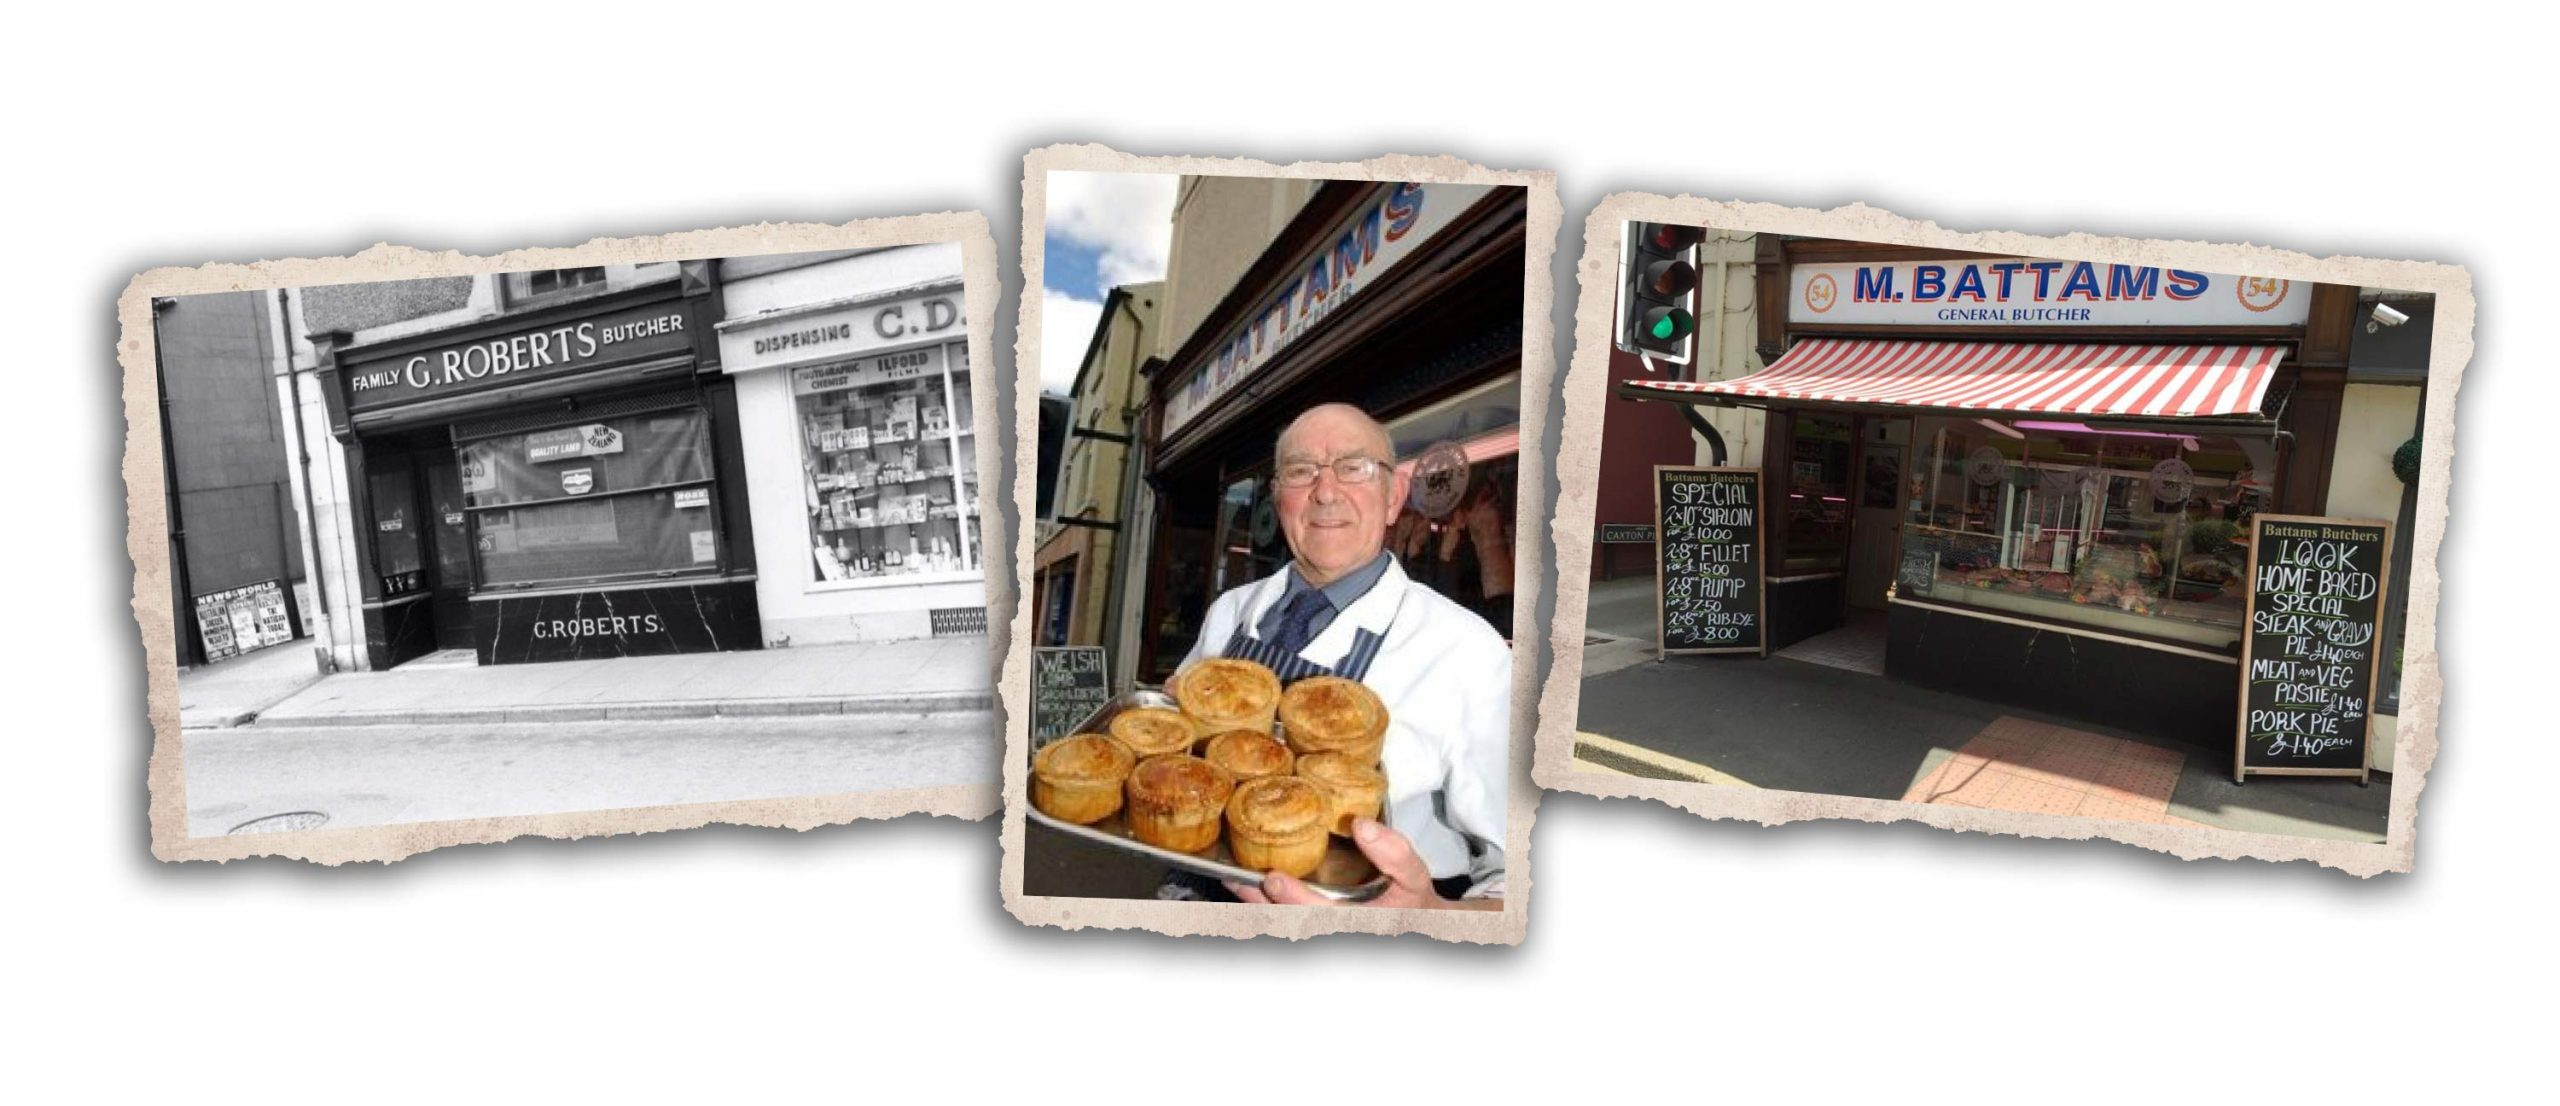 M Battams Butchers Butchers in Oswestry Shropshire